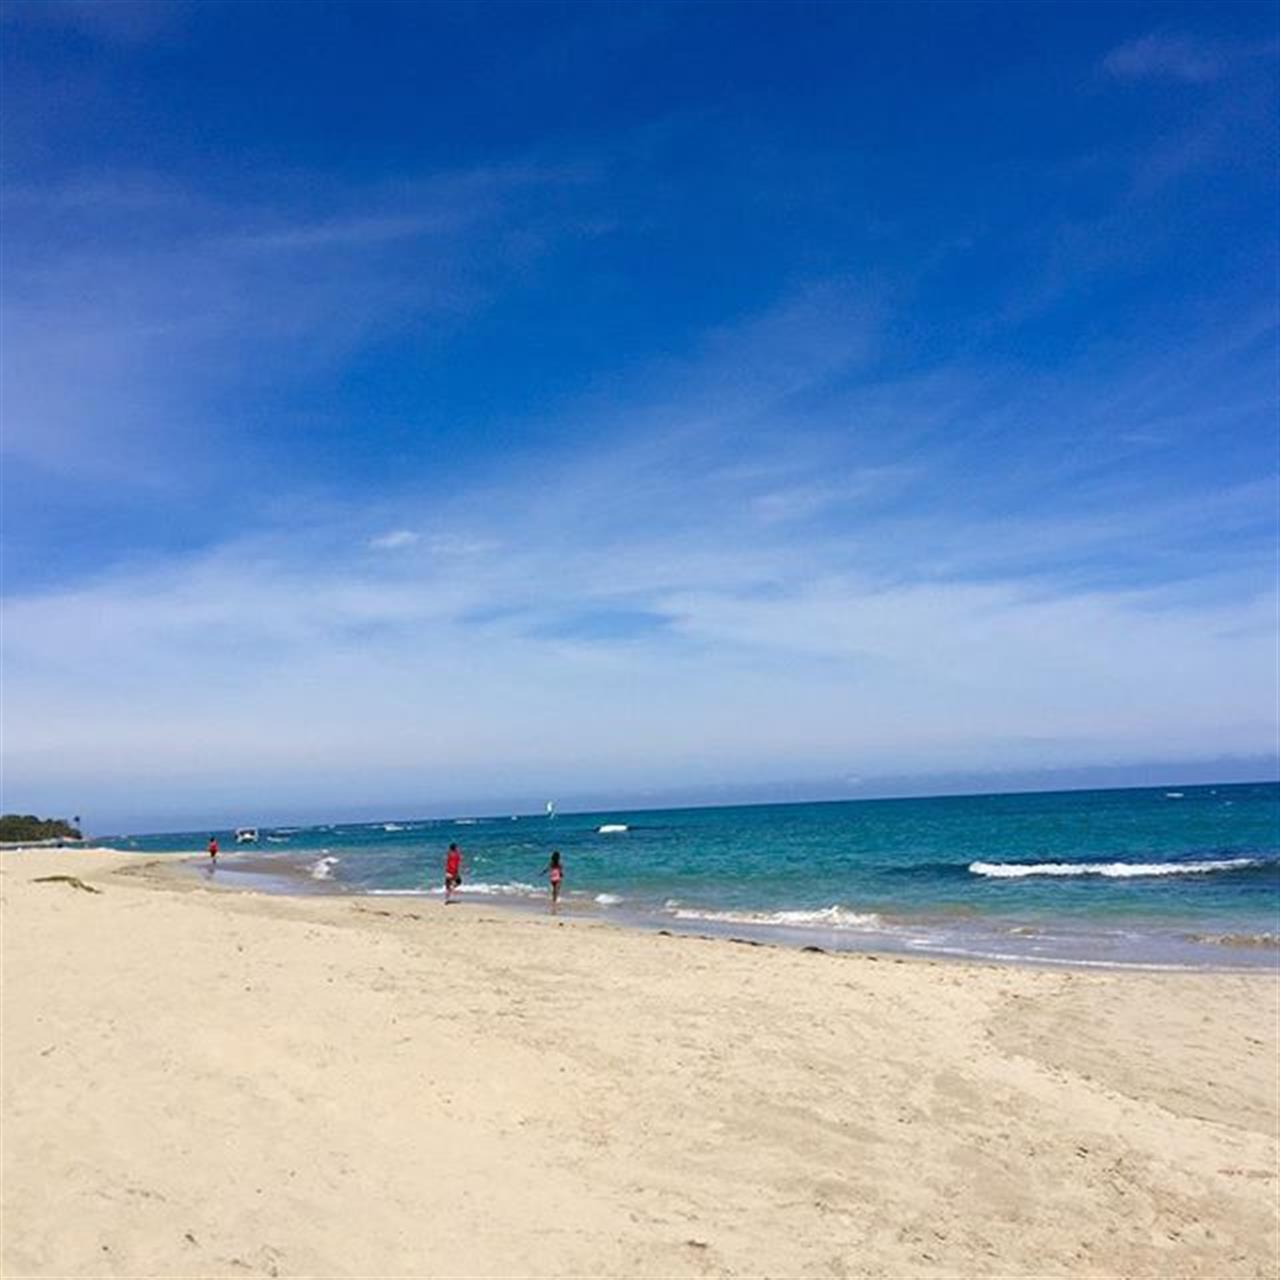 The beach in Costa Dorada in Puerto Plata. #beach #leadingrelocal #DominicanRepublic #sailing #surfing #sun #northcoast #realestate